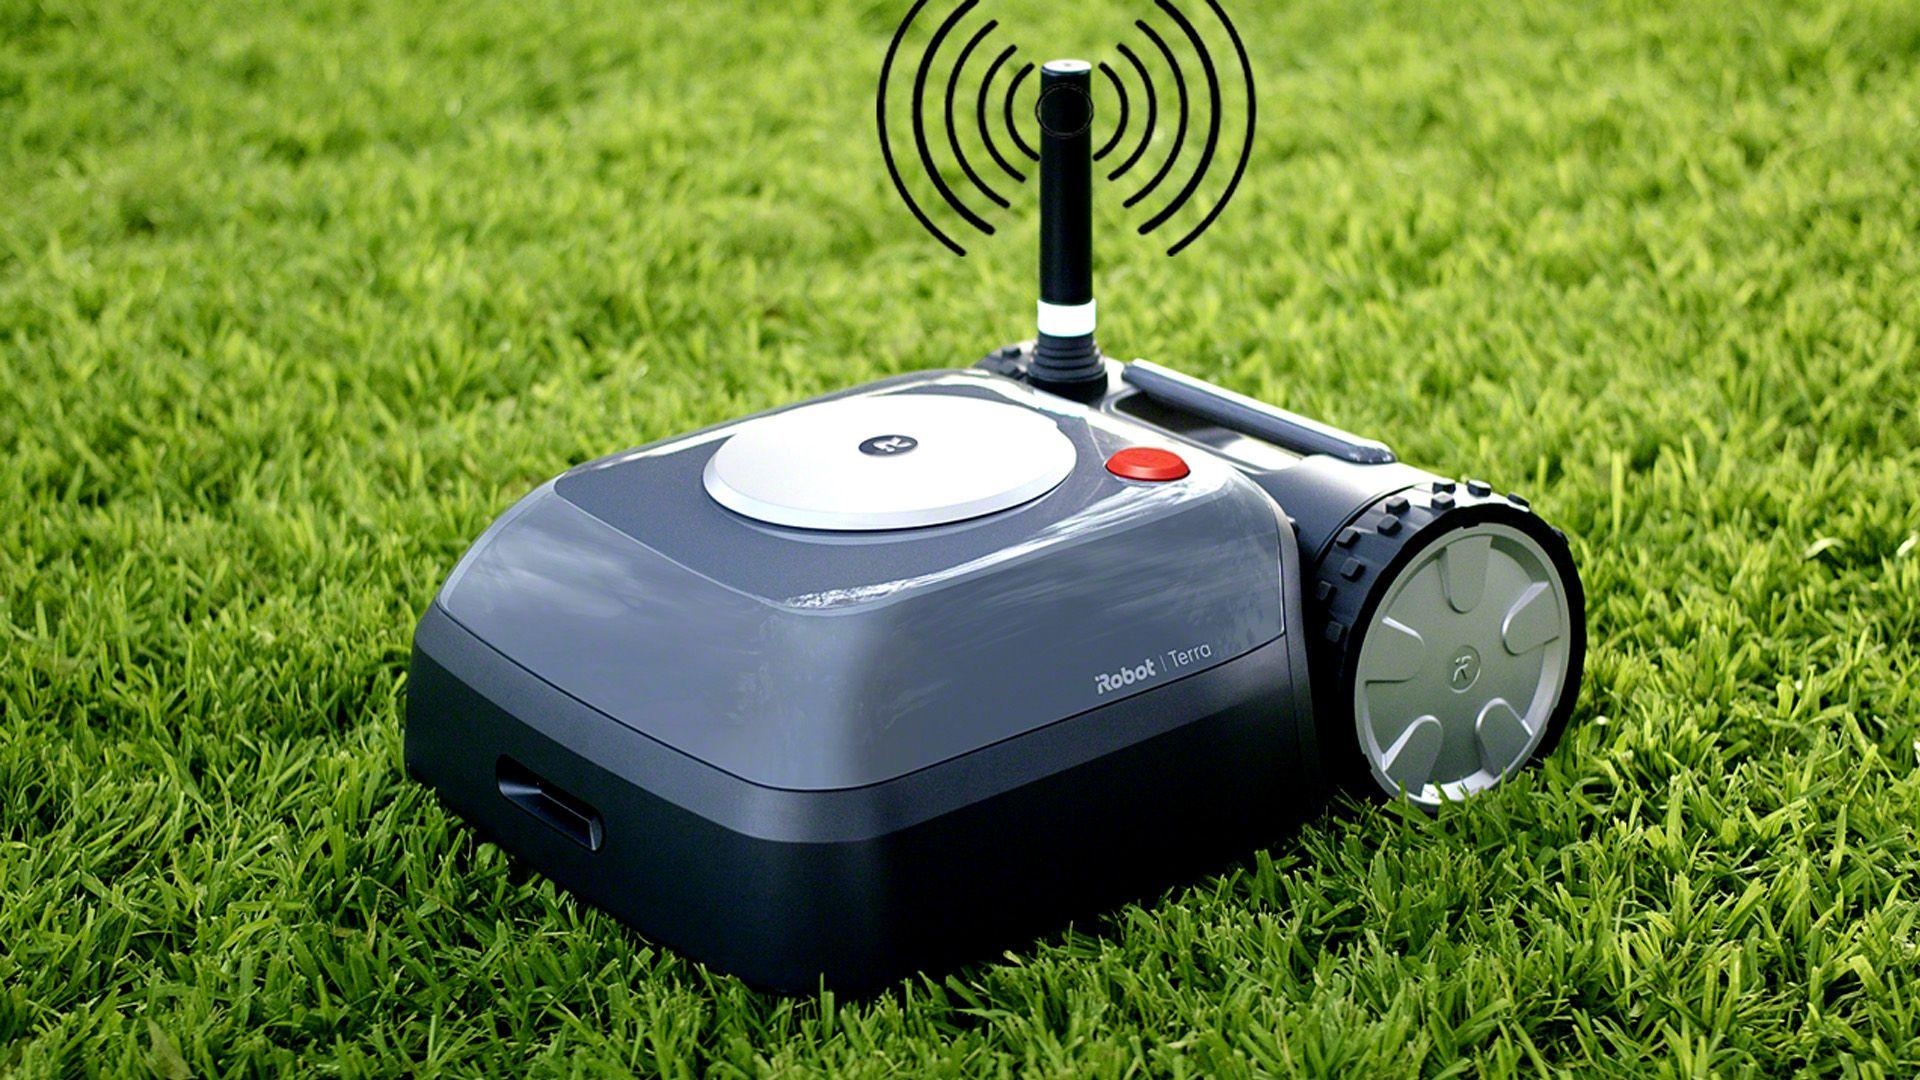 Pin by TechMooz on Garden Gadgets Robotic lawn mower